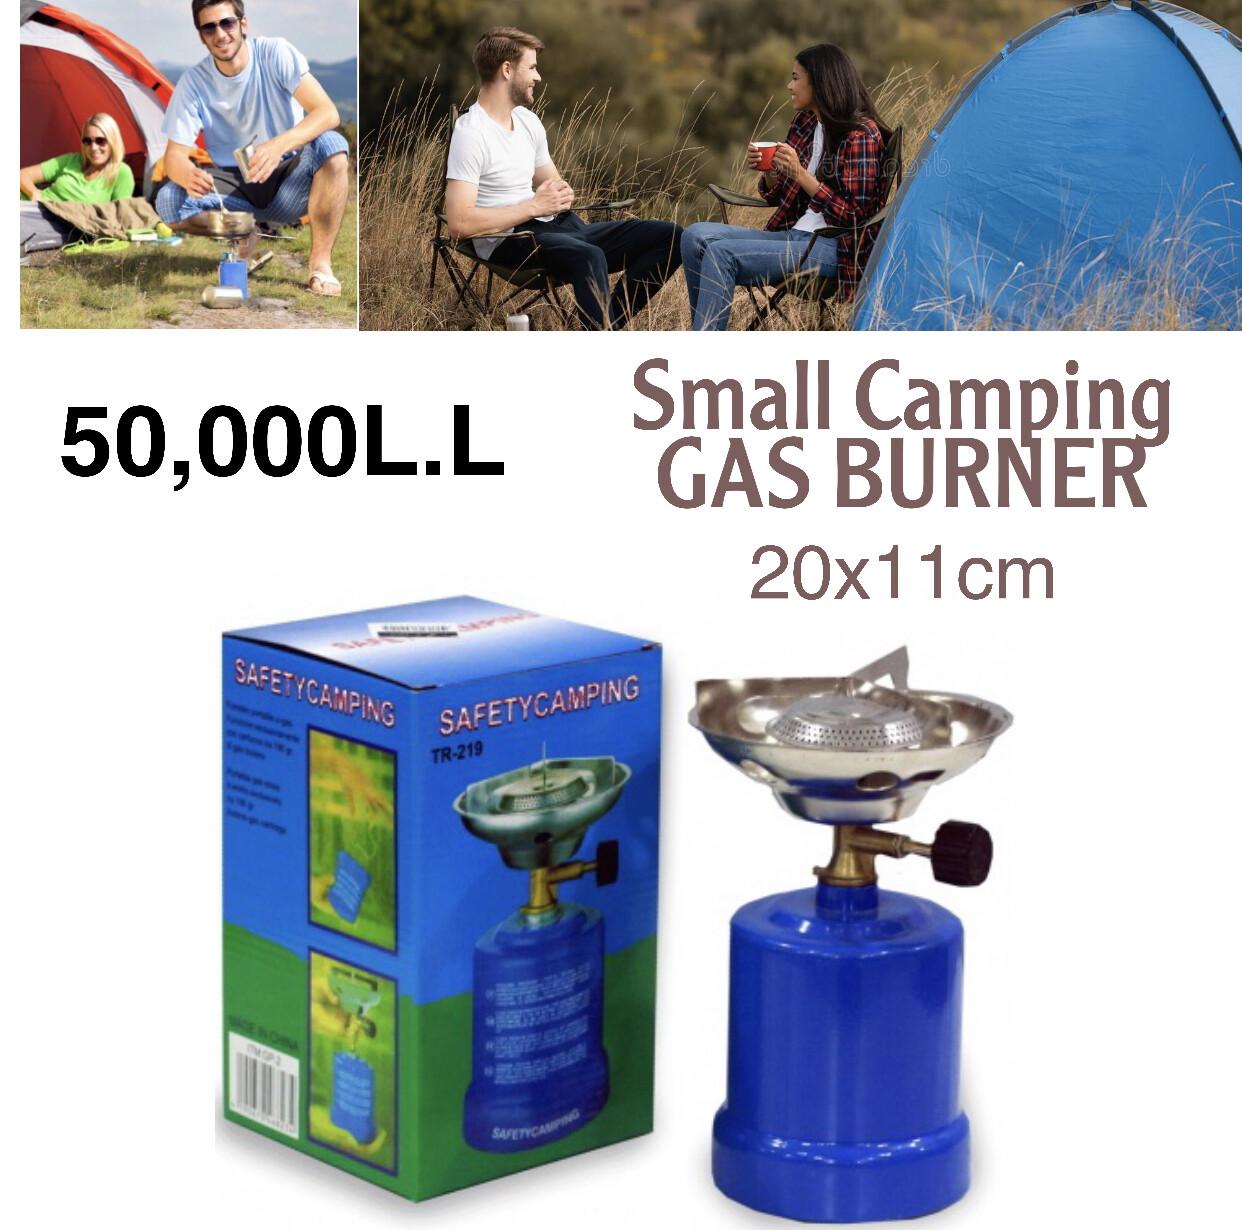 Small Gas Burner 20cm